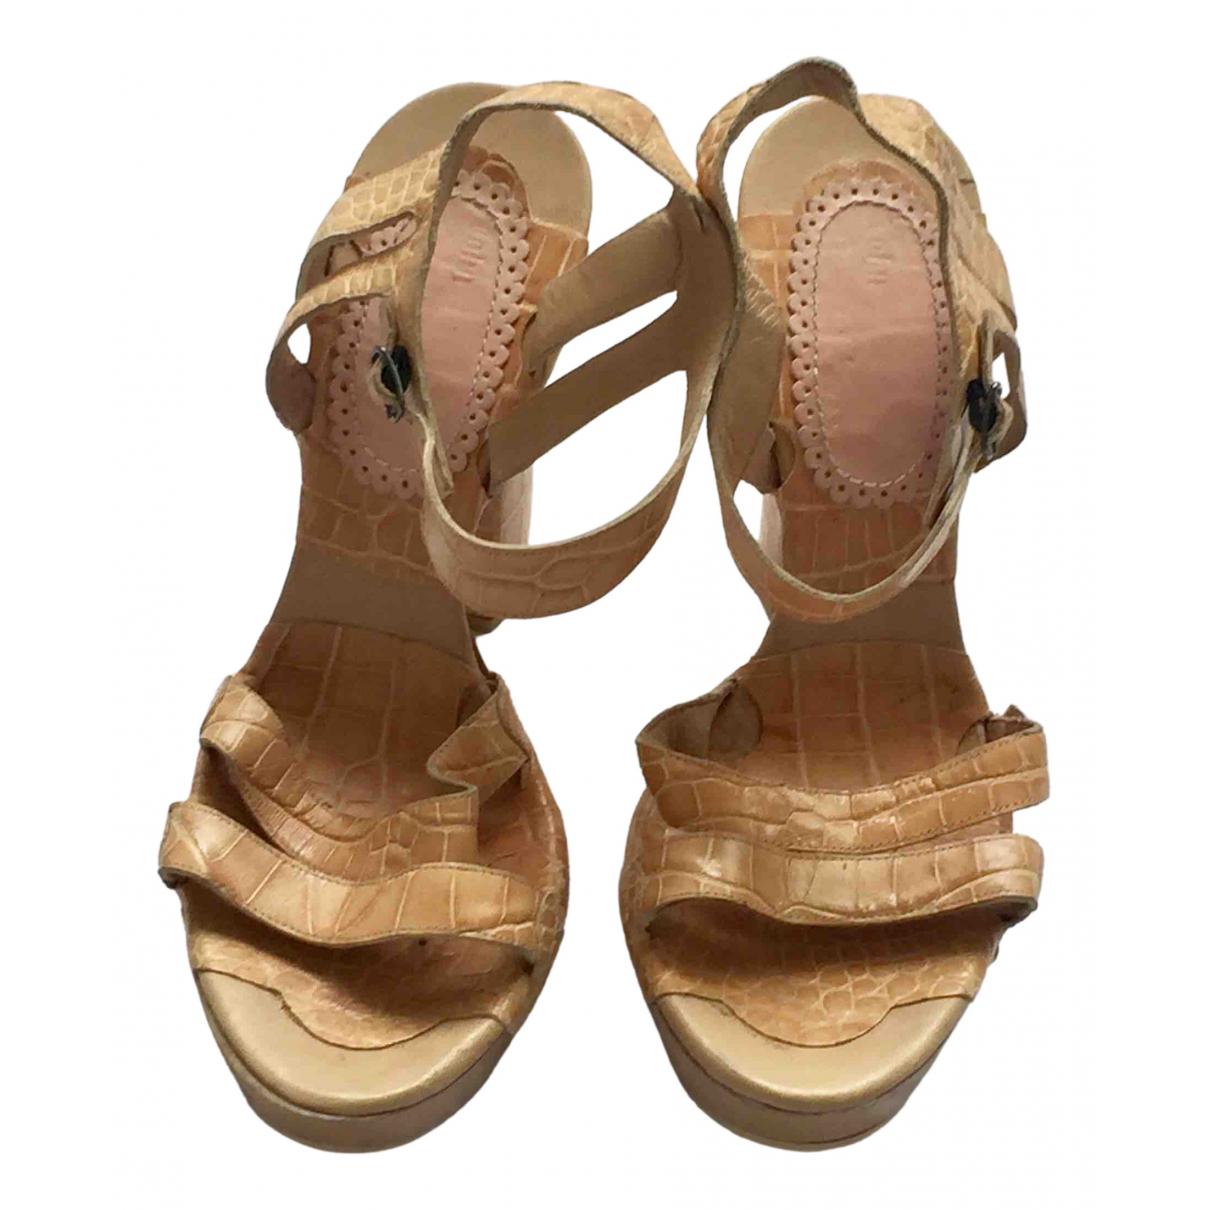 John Galliano N Beige Leather Sandals for Women 40 EU